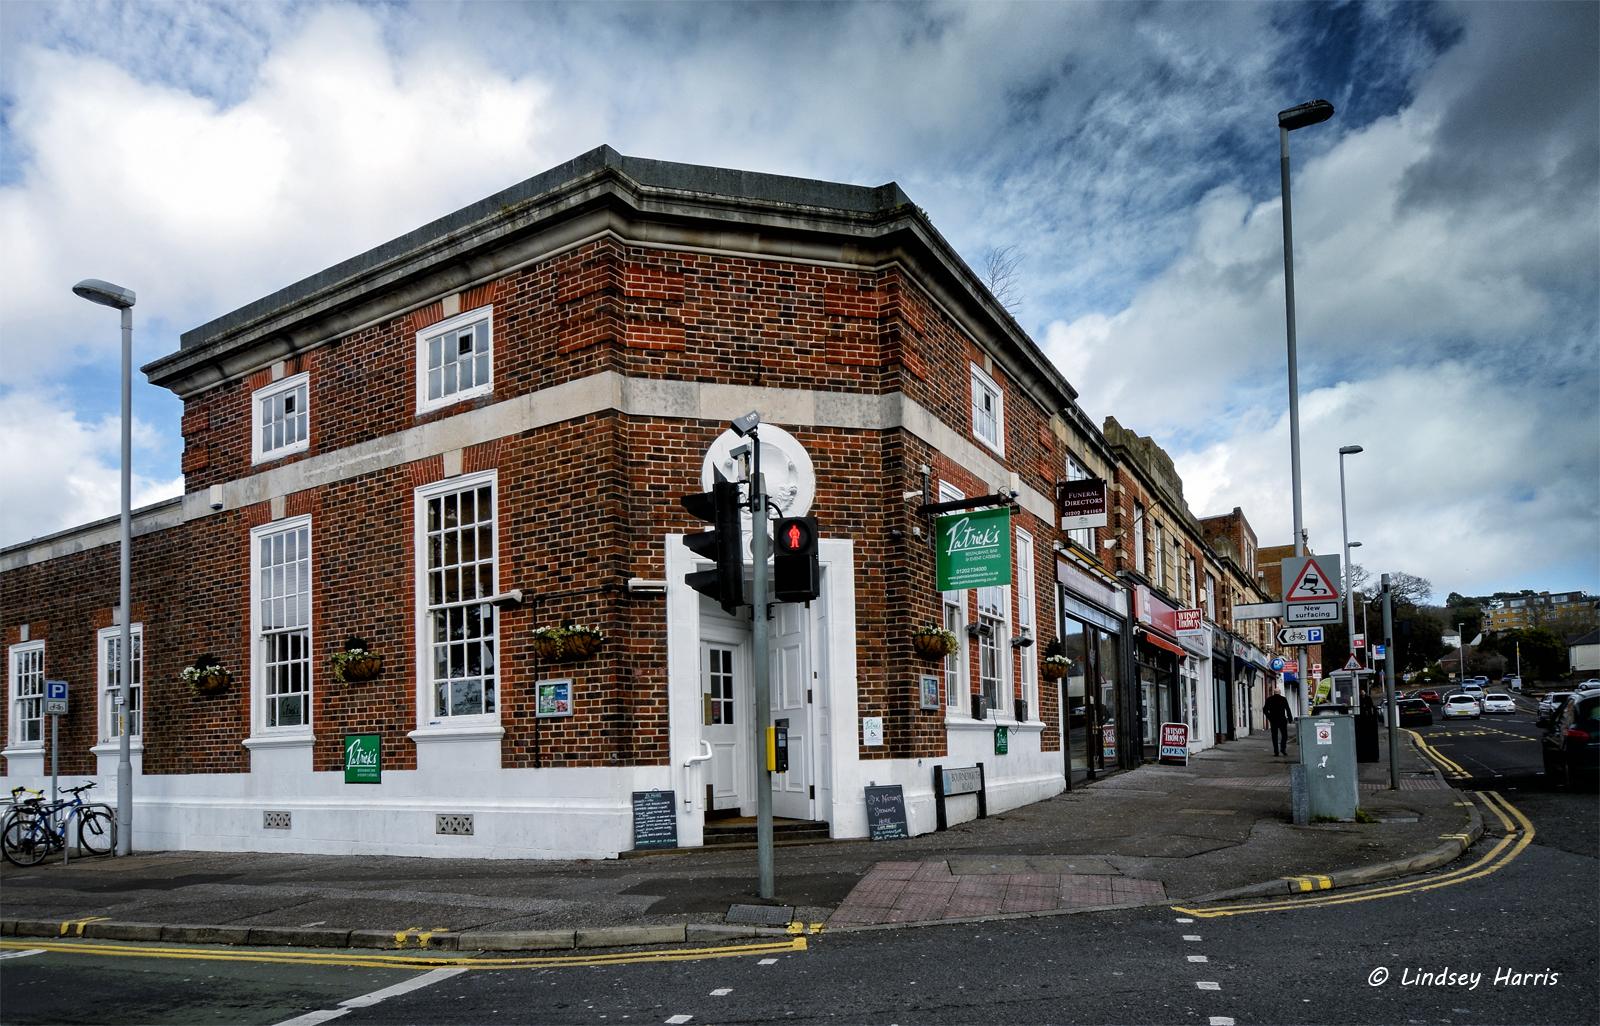 Patrick's, Lower Parkstone, Poole